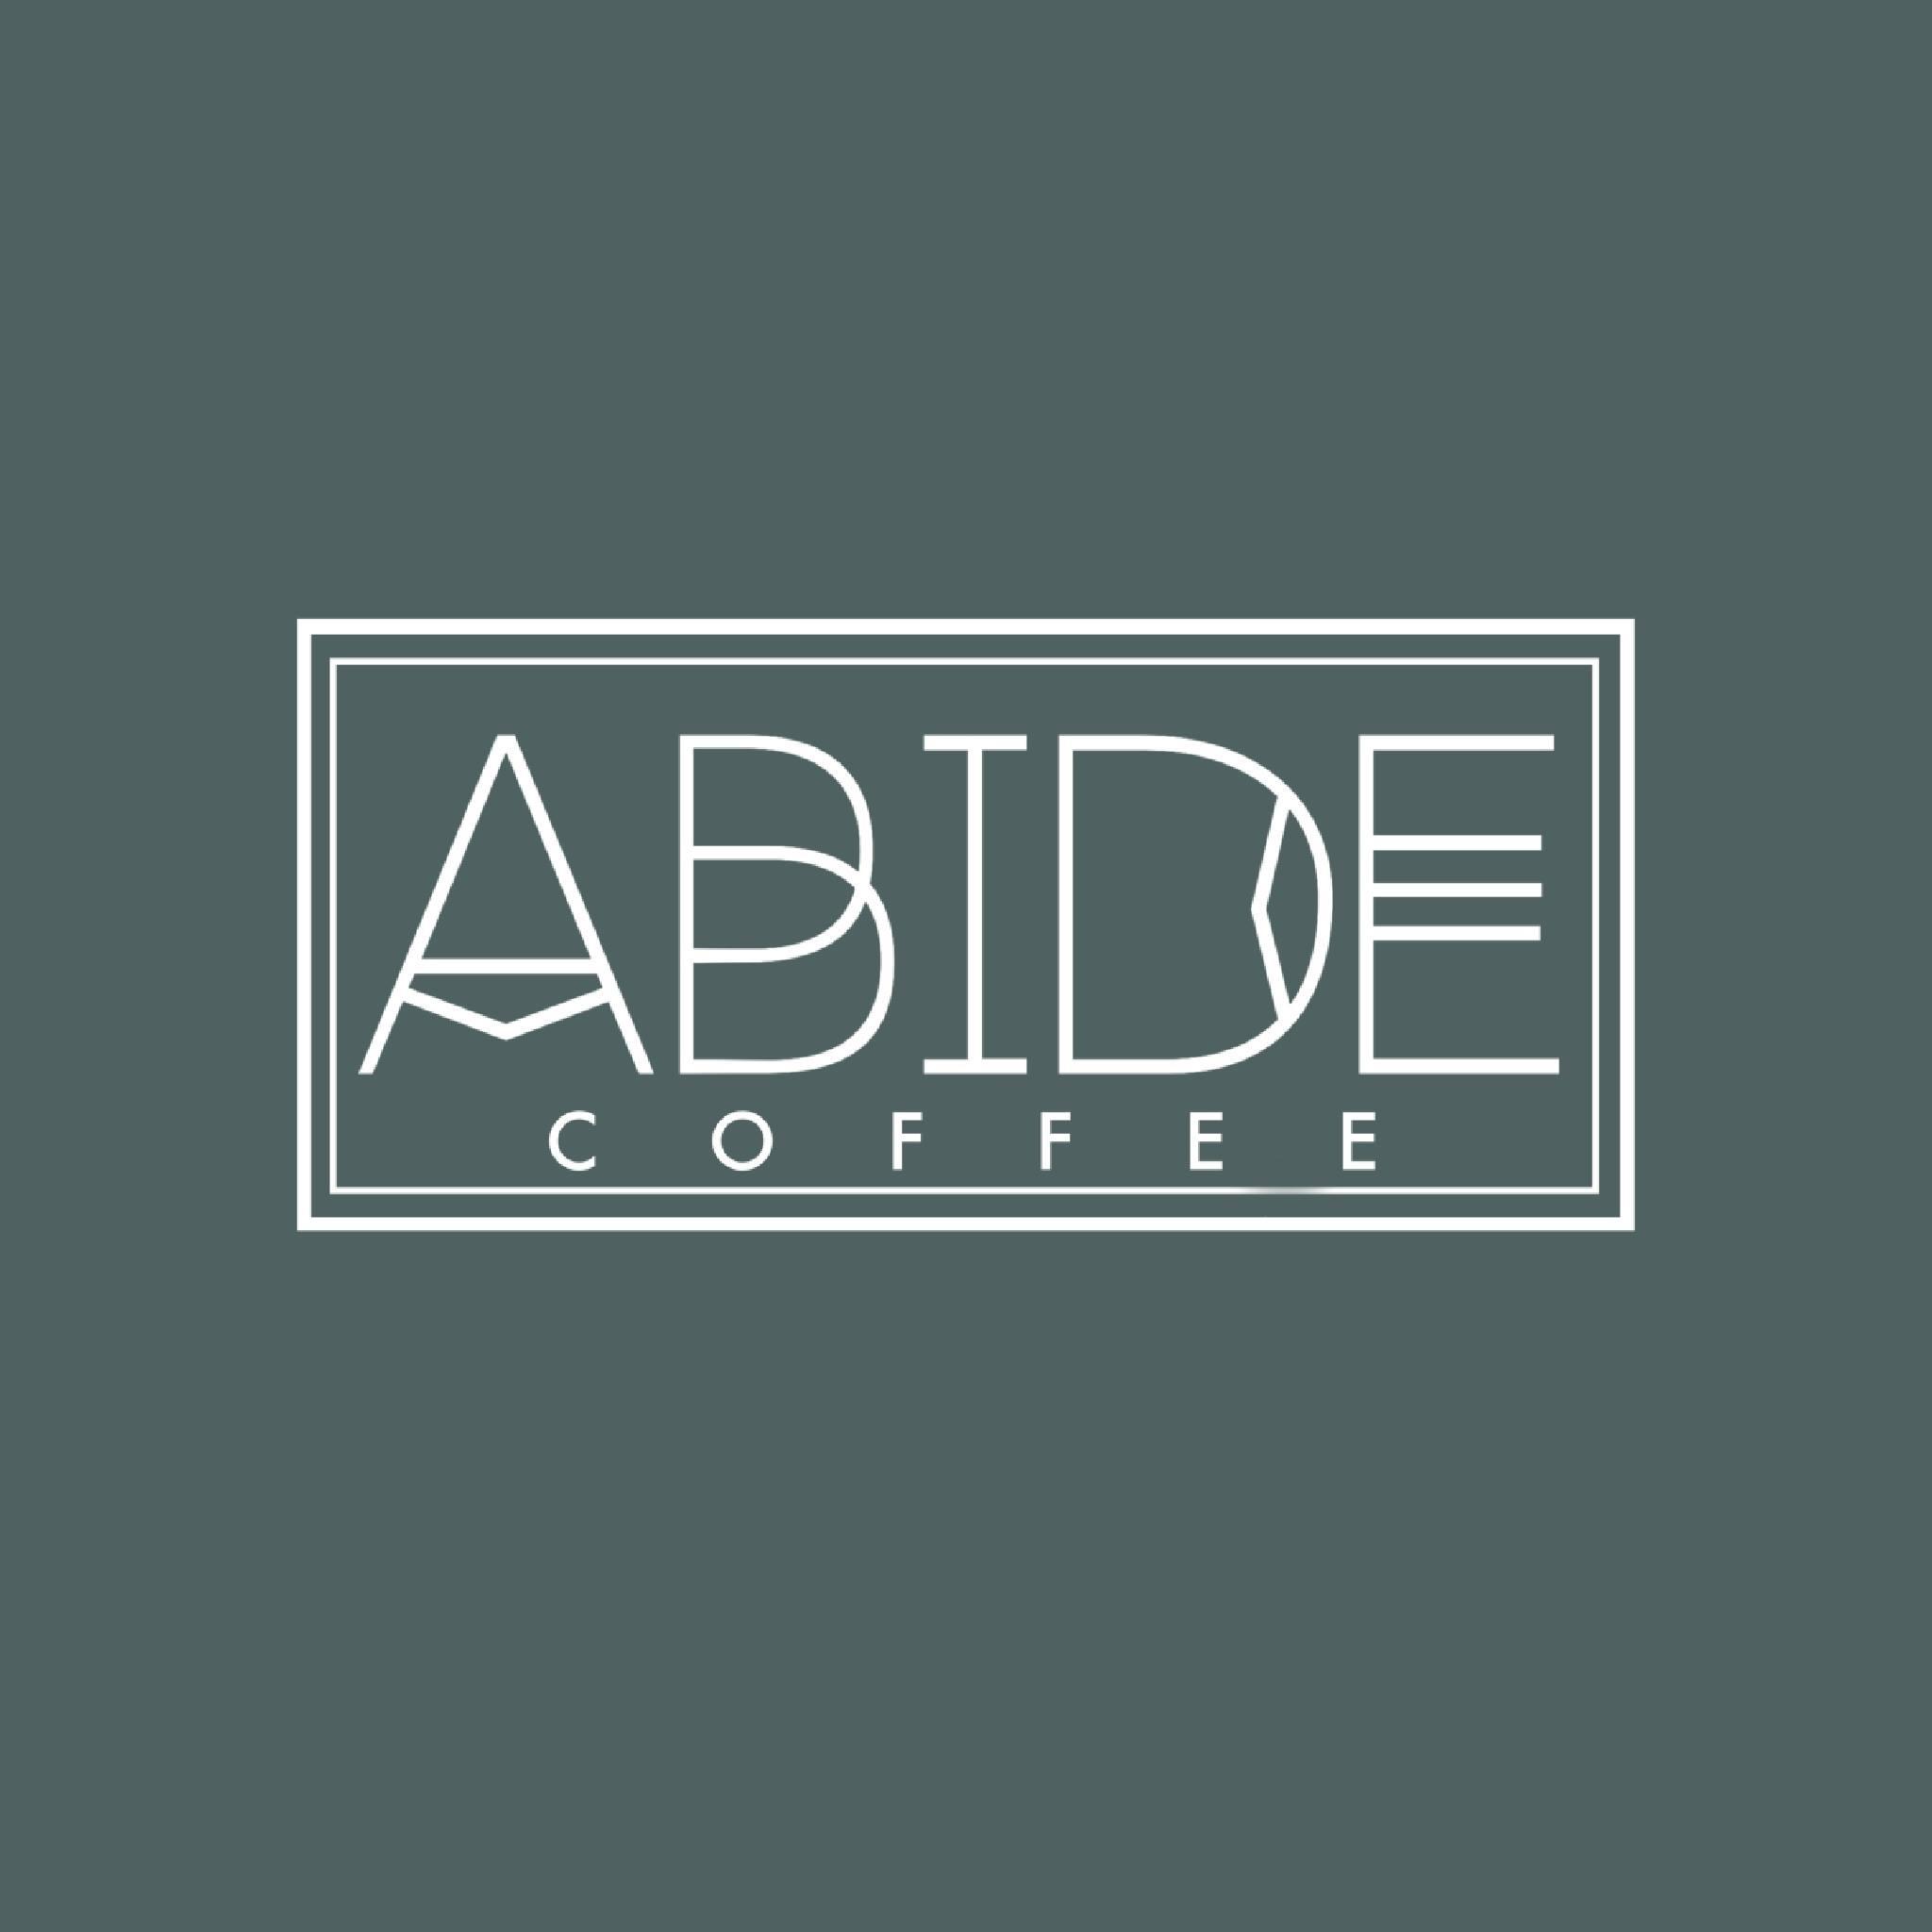 Abide Coffee